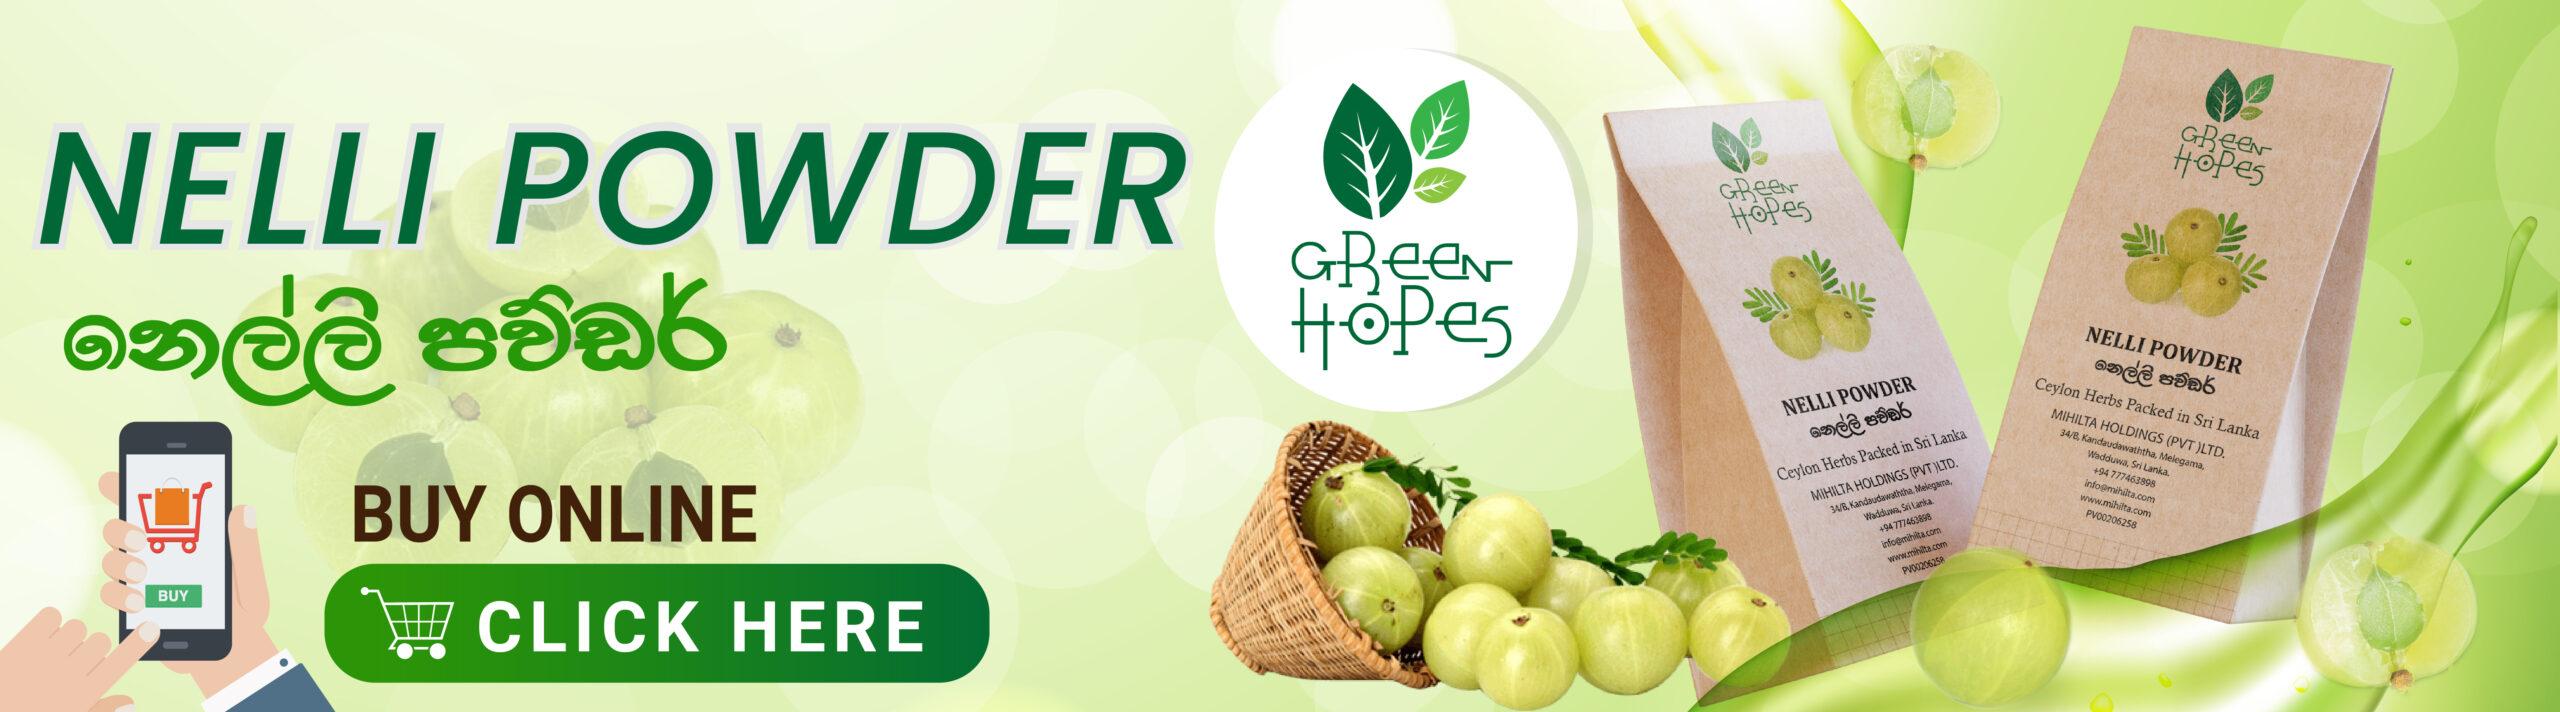 Greenhopes-Amlapowder